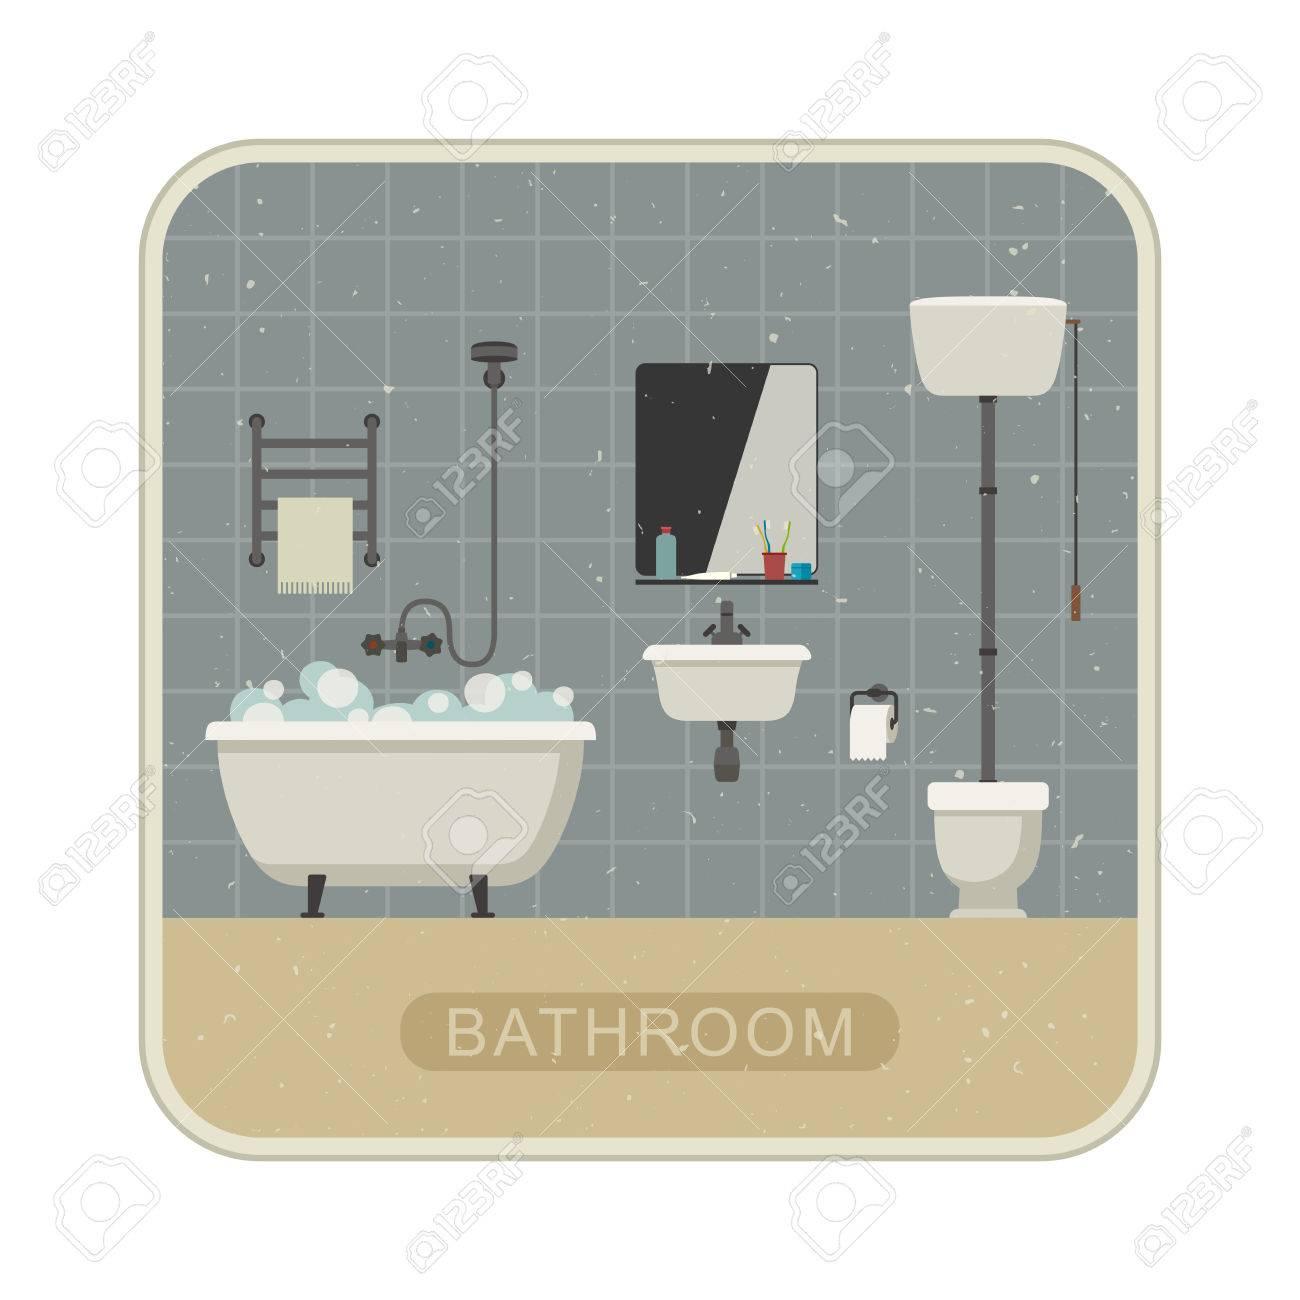 Cool Painting Bathtub Huge Can I Paint My Bathtub Flat Bathtub Refinishing Company Painted Bathtub Young How To Paint Tub Purple Bathtub Refinishing Service